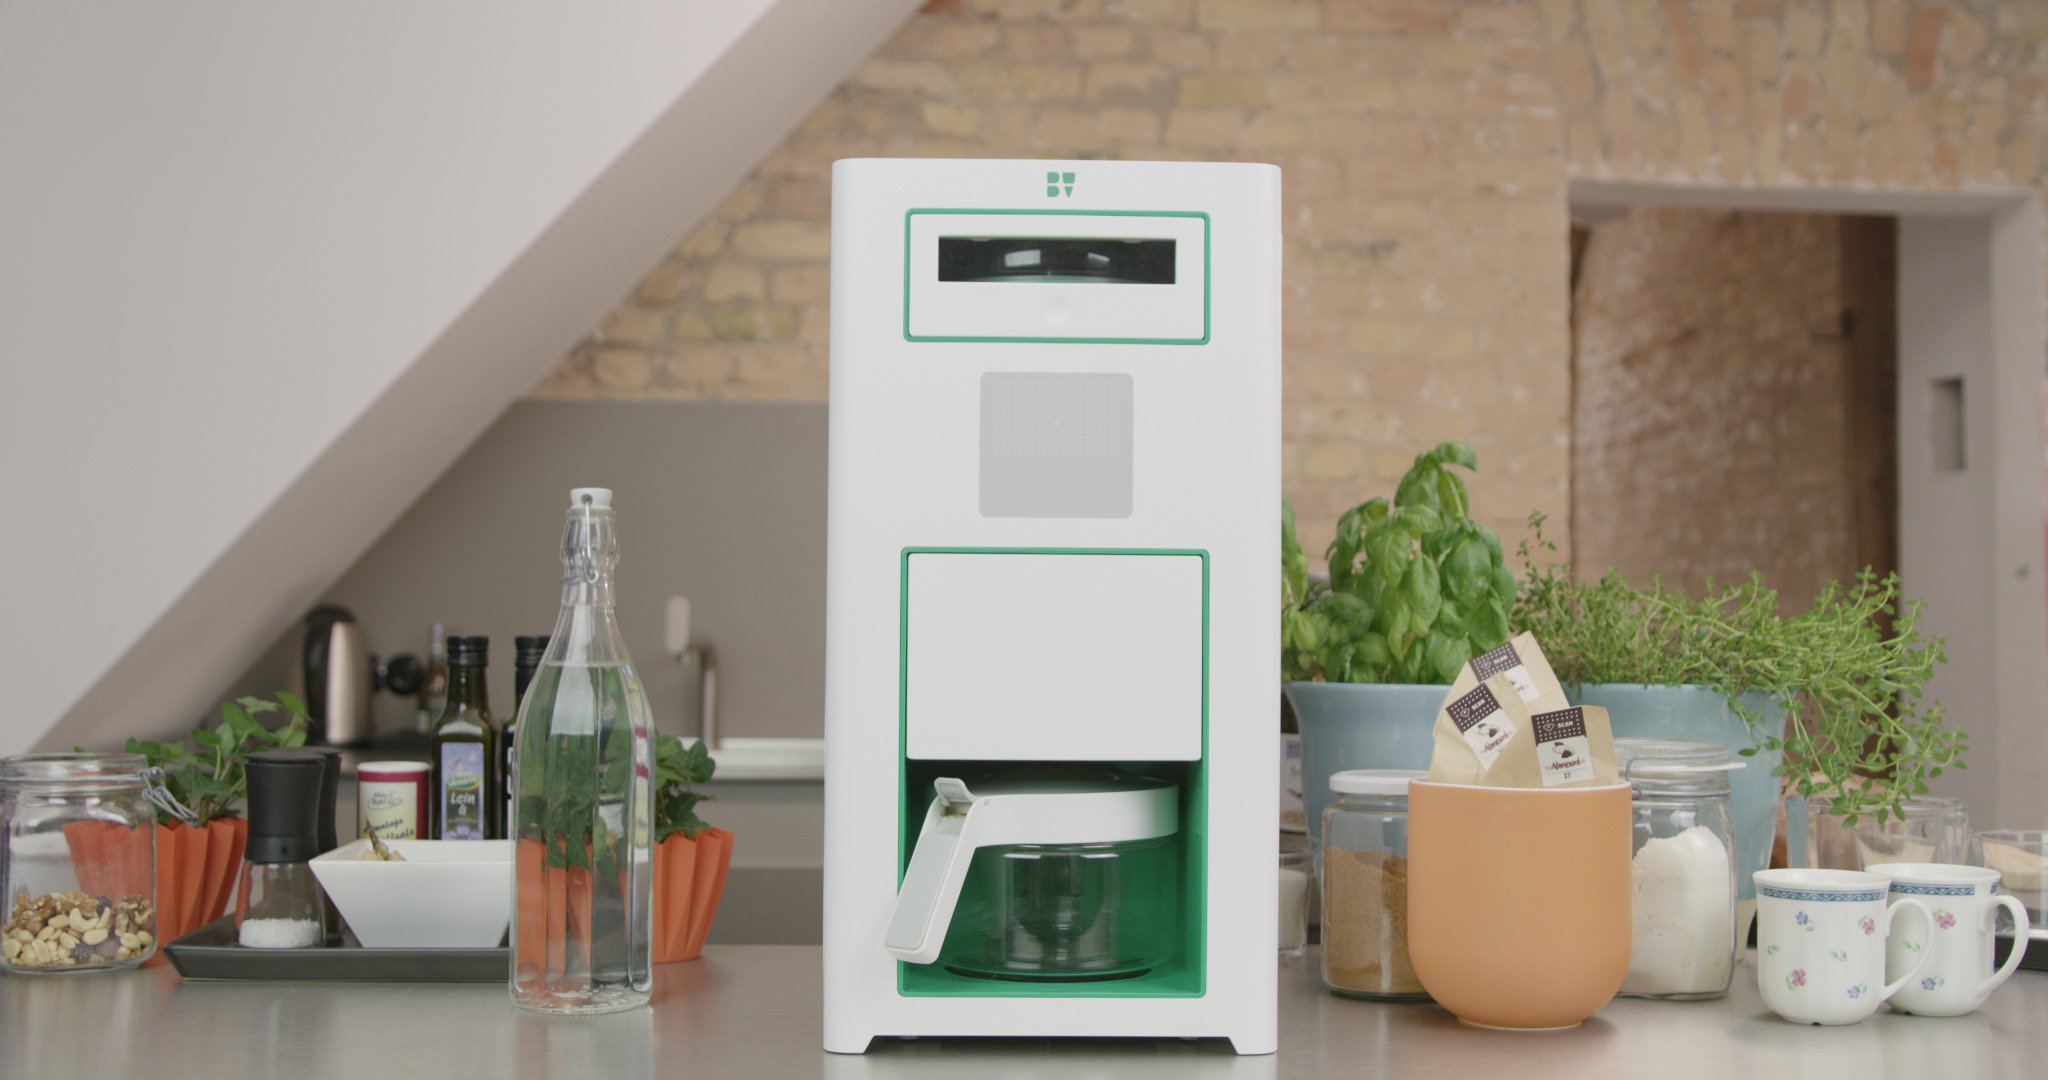 Bonaverde White Roast-Grind-Brew Coffee Machine, White with Green Accents